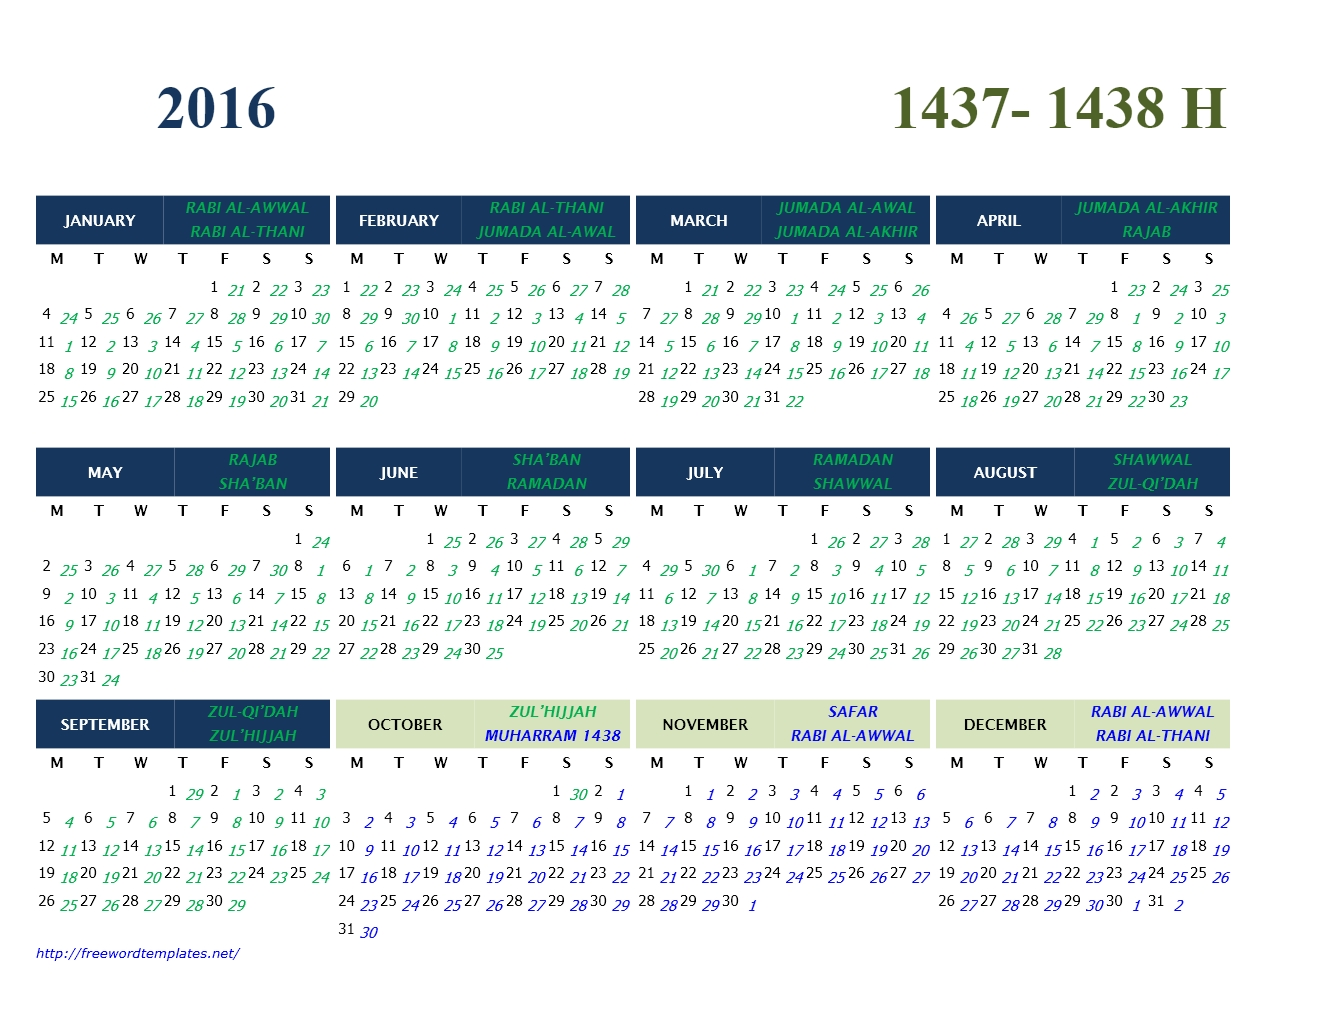 2016 Islamic Calendar Template pertaining to Islamic Year Hijri 1438 Images